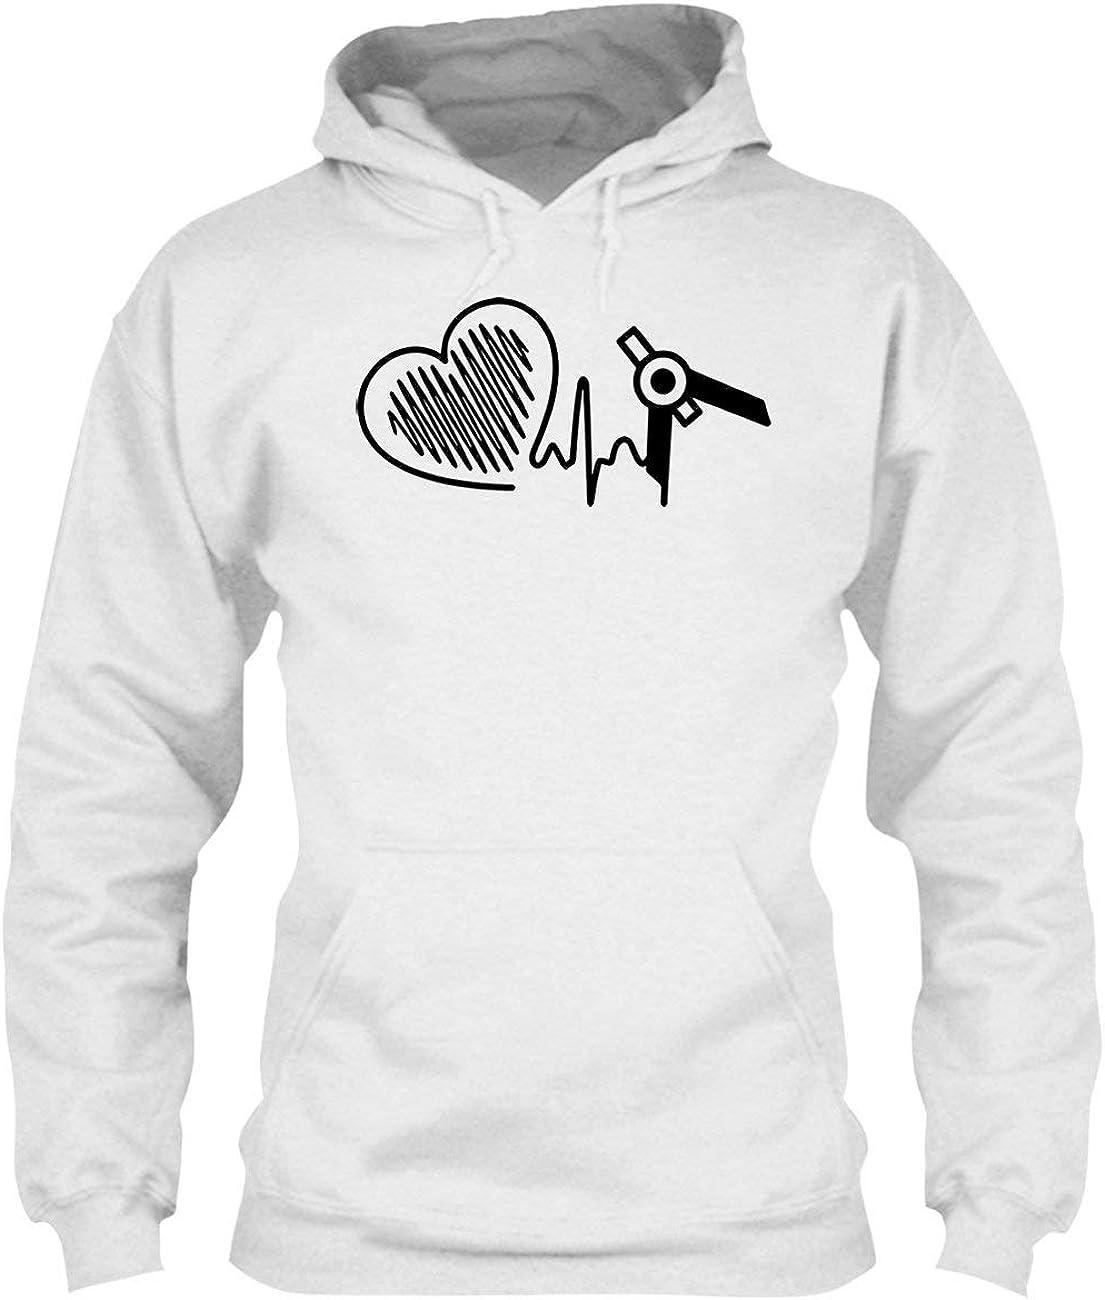 Sweatshirt Hoodie Bookbinder Voice Tee Shirt